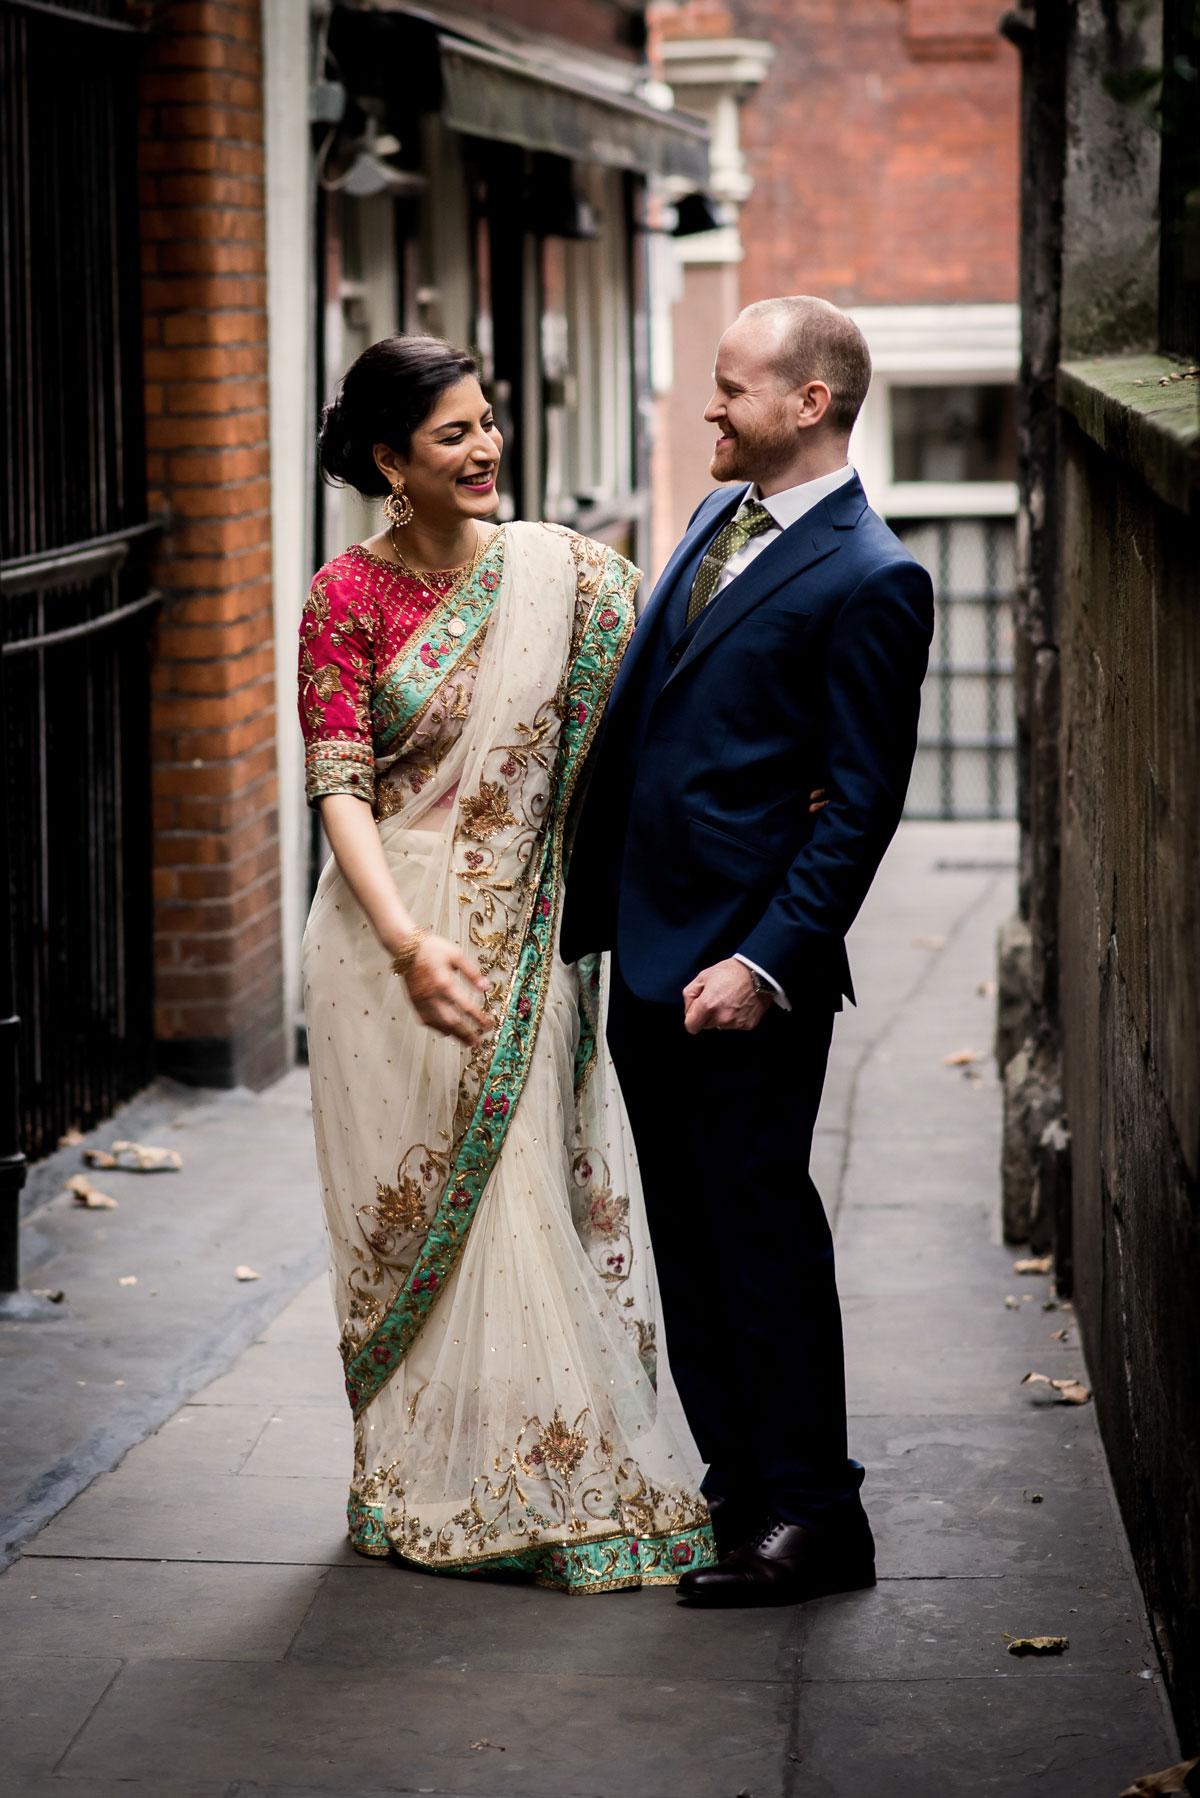 wedding-at-st-brides-0008